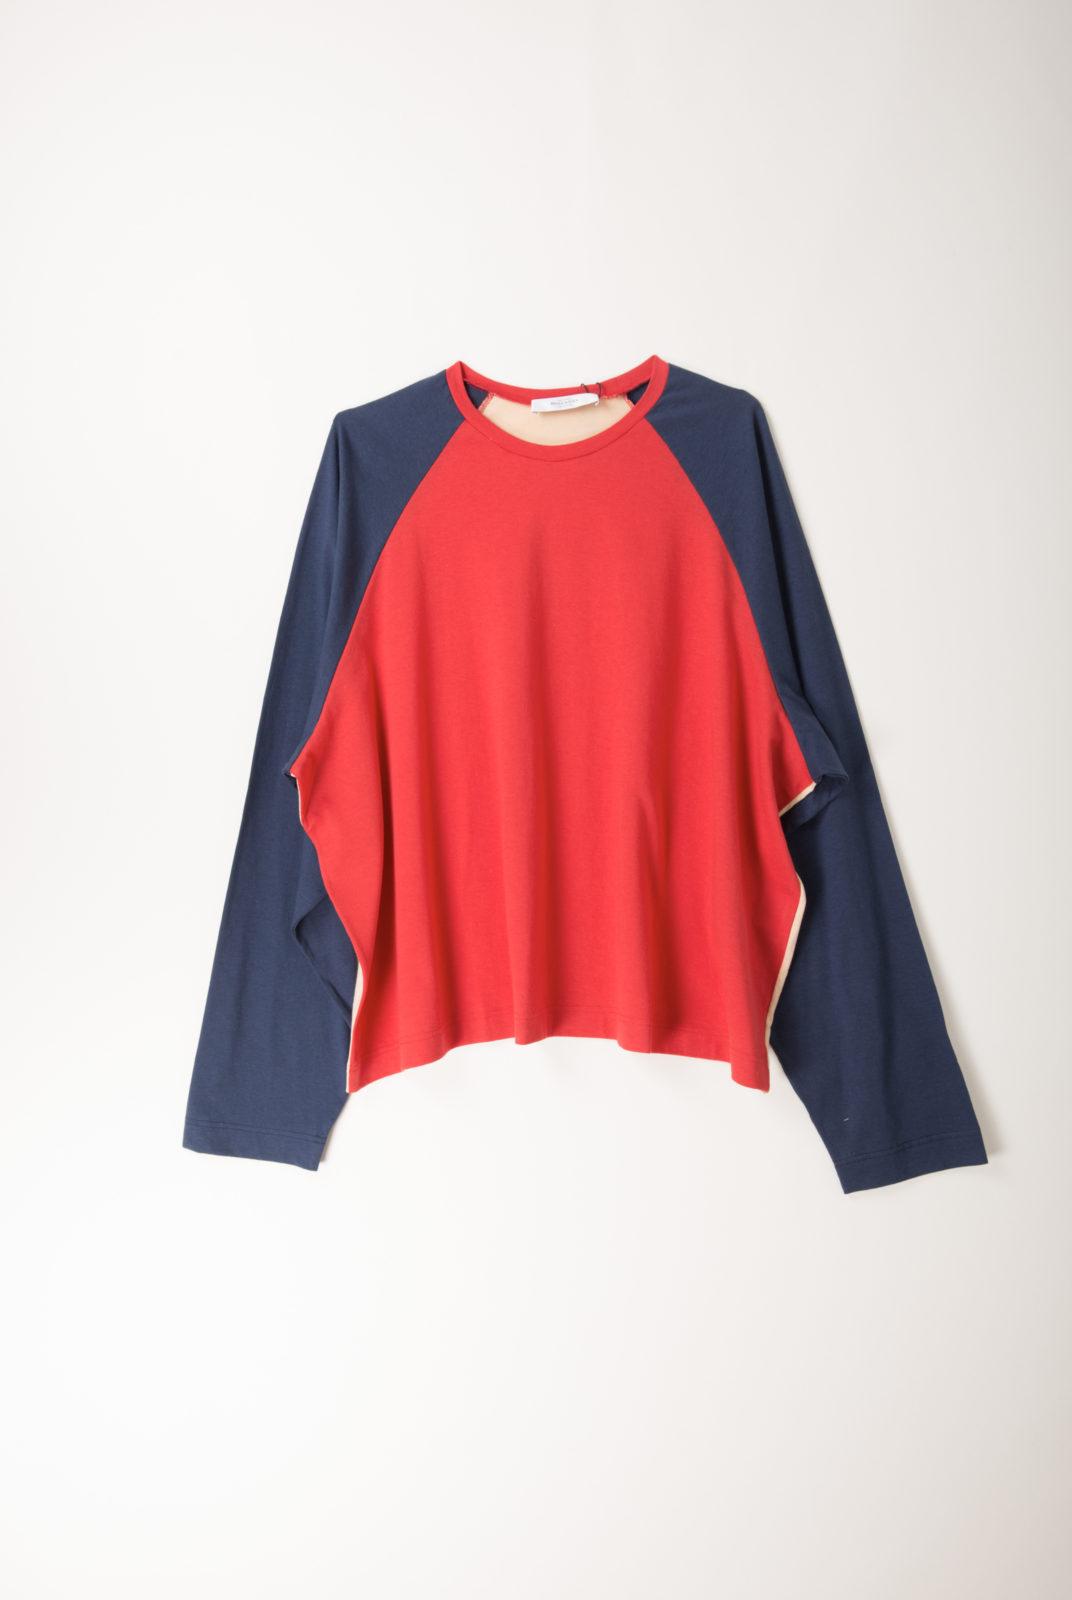 top jersey en coton, silhouette oversize, rouge et bleu, roseanna